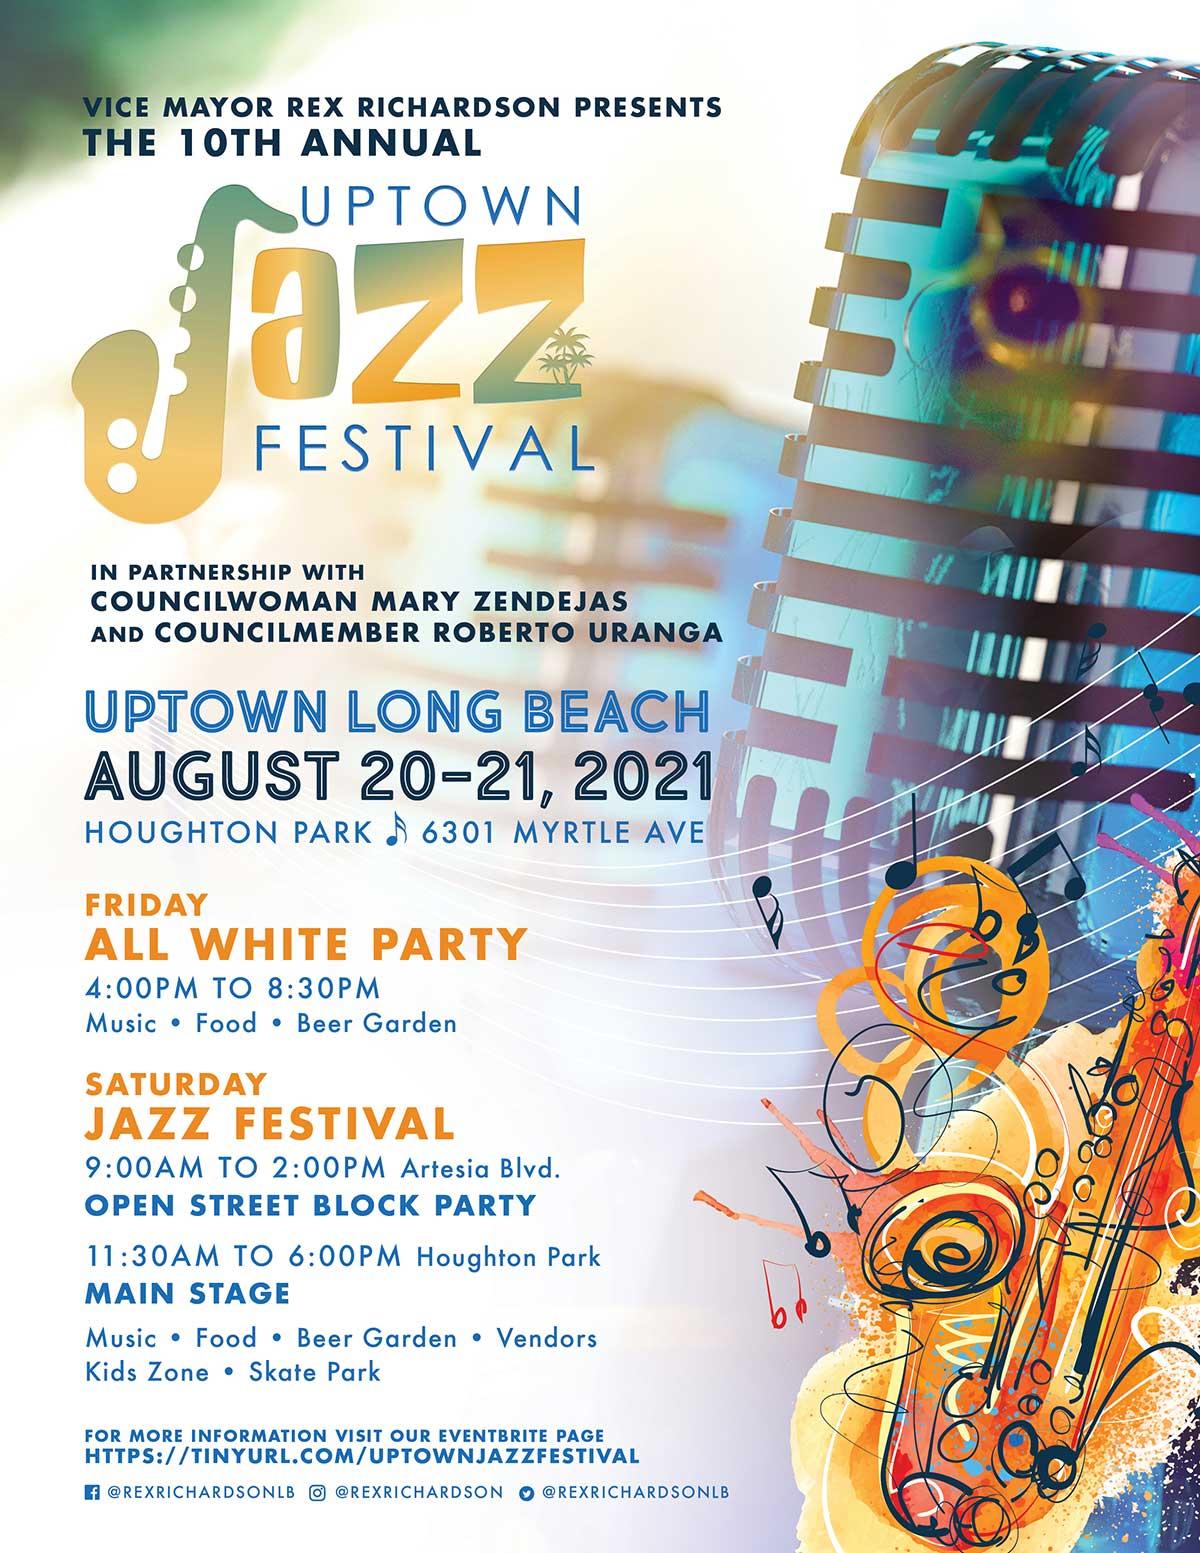 Uptown Jazz Festival